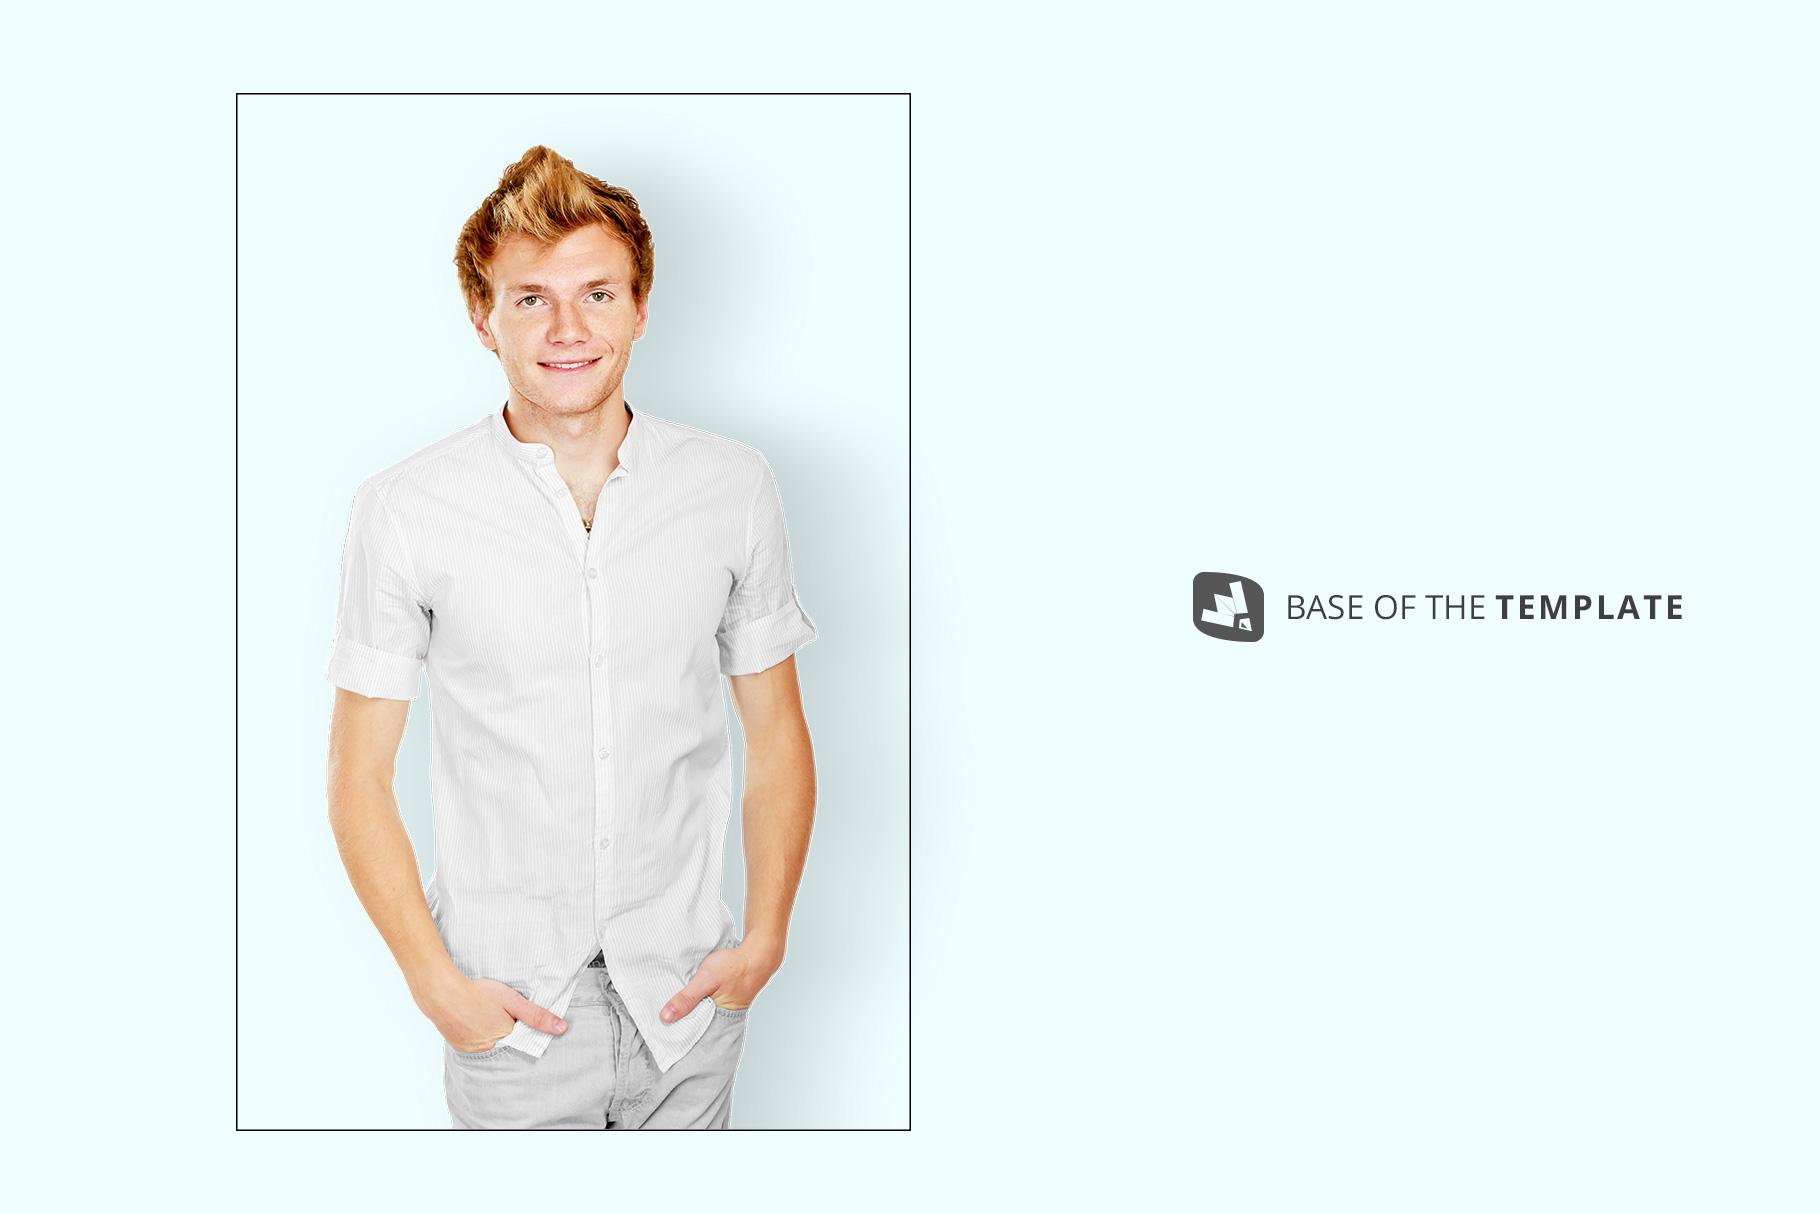 base image of the male y-neck shirt mockup